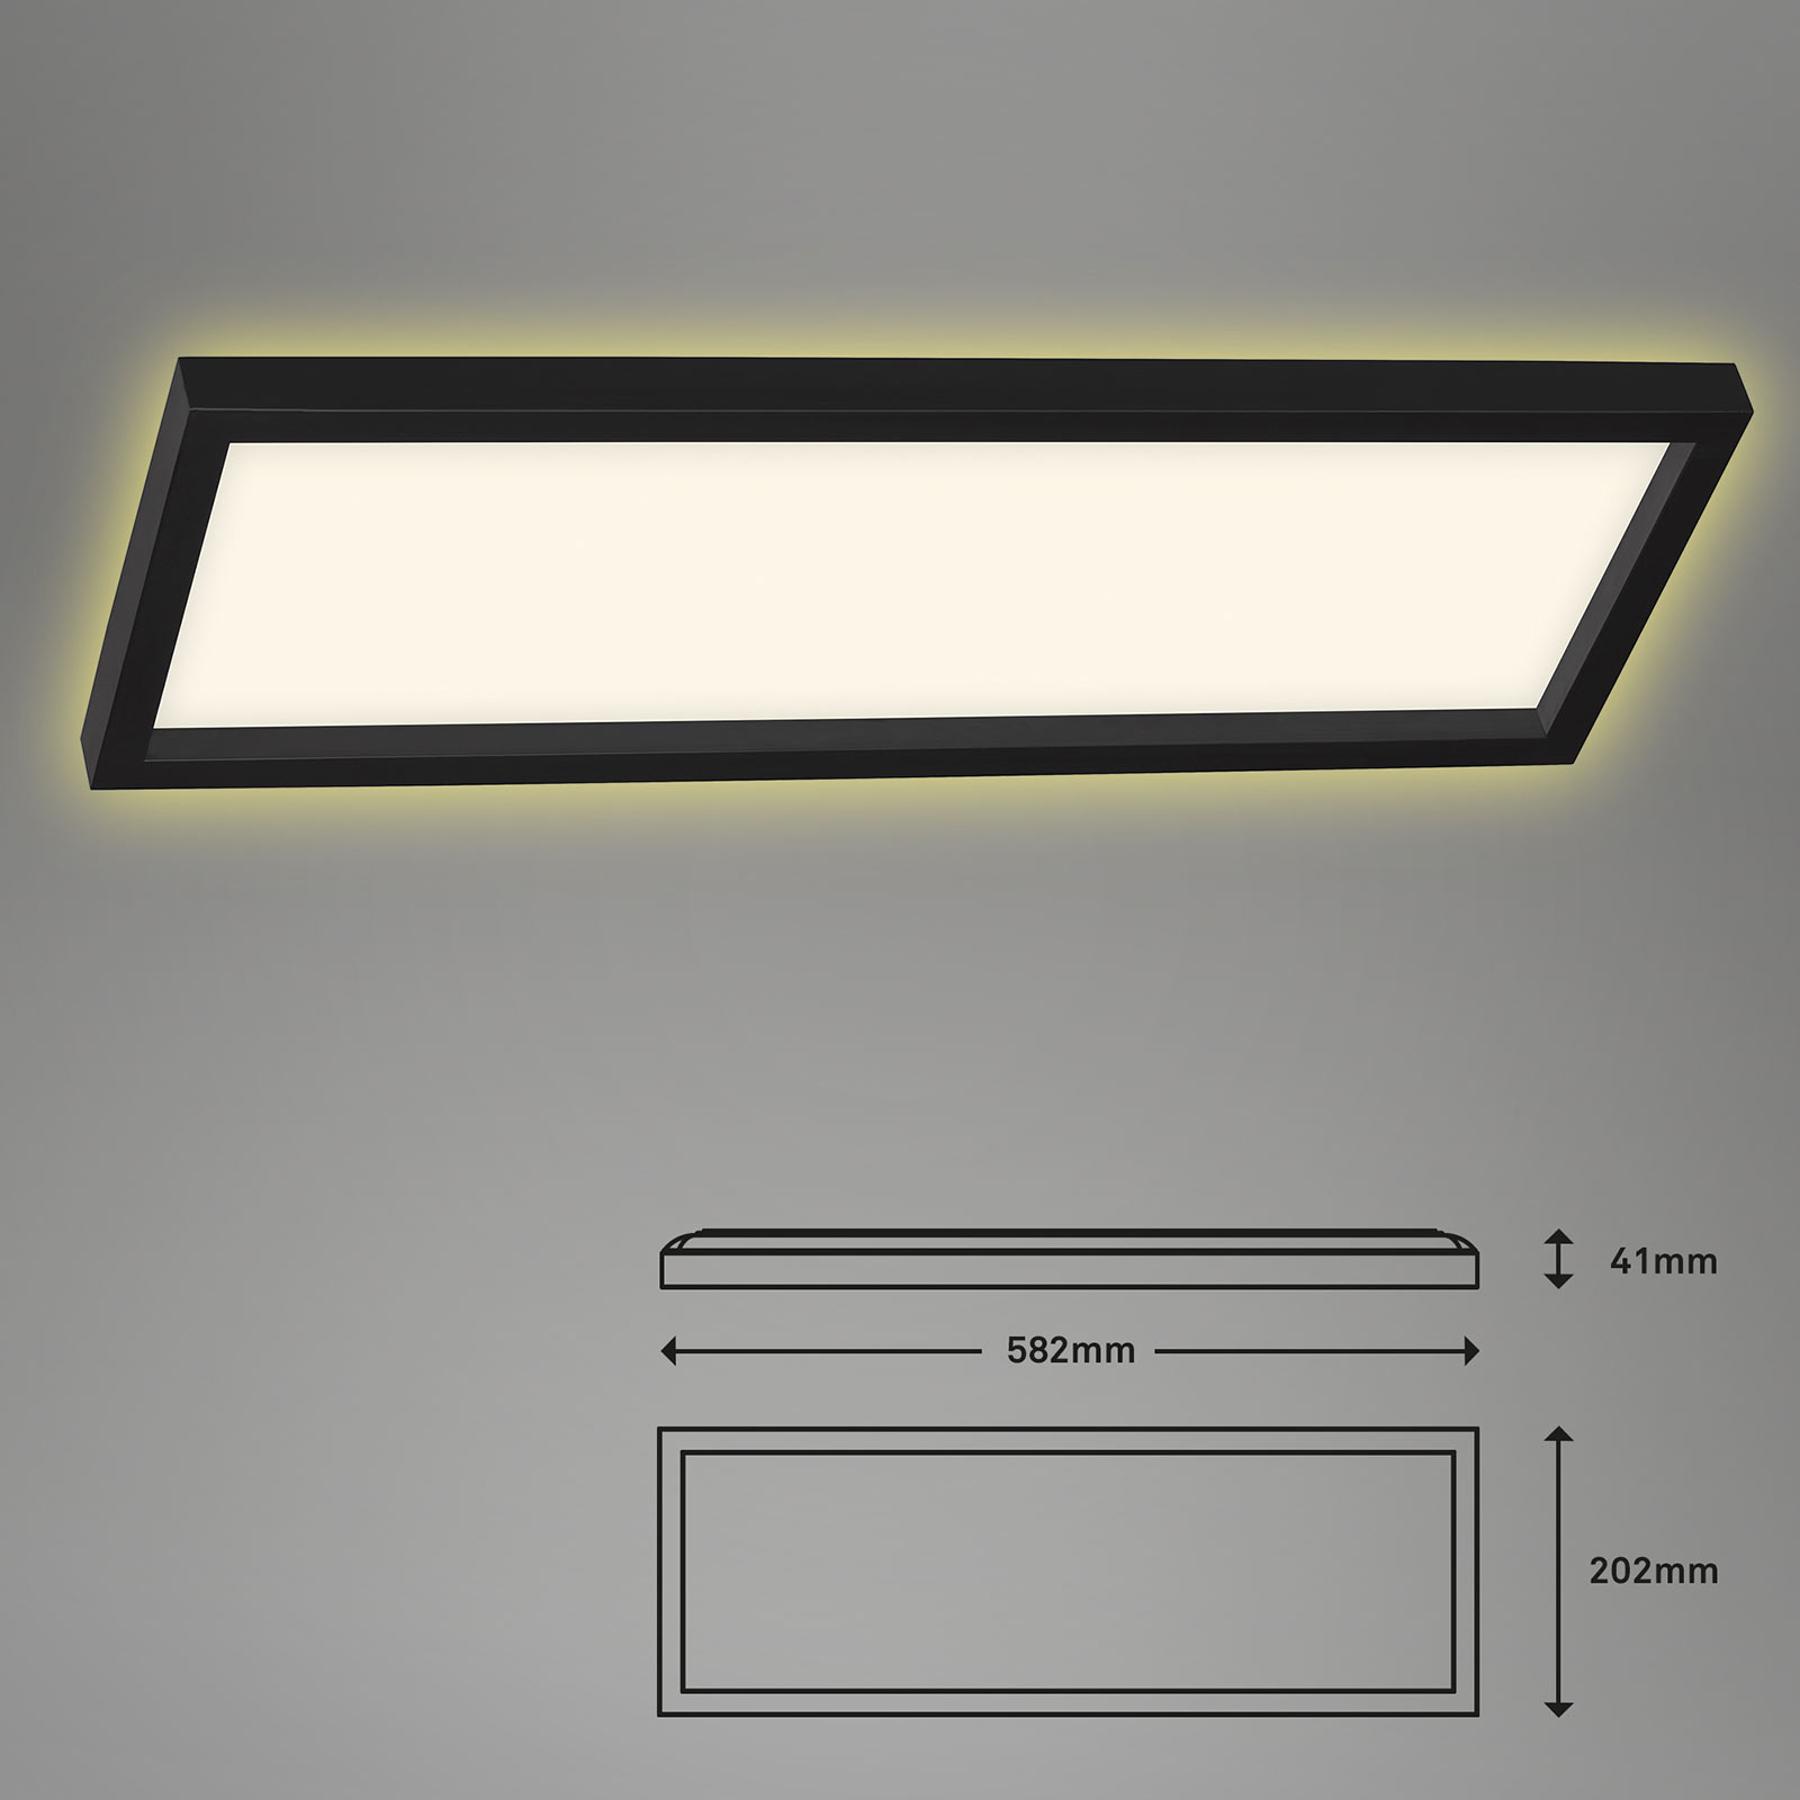 Lampa sufitowa LED 7365, 58 x 20 cm, czarna